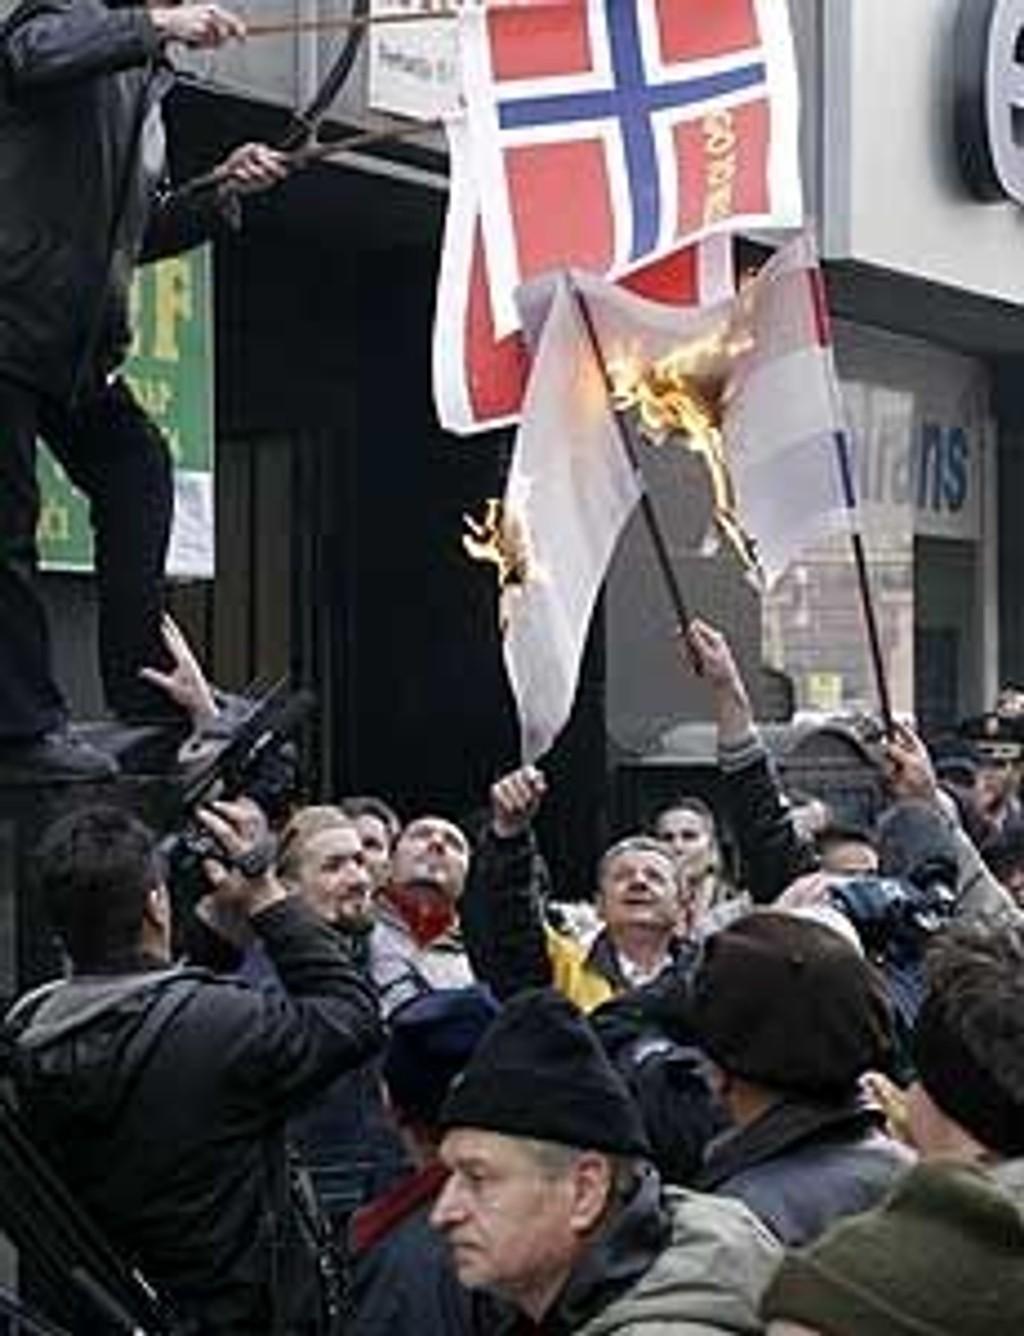 Demonstranter brenner norske og danske flagg utenfor den norske ambassaden i Sarajevo onsdag.